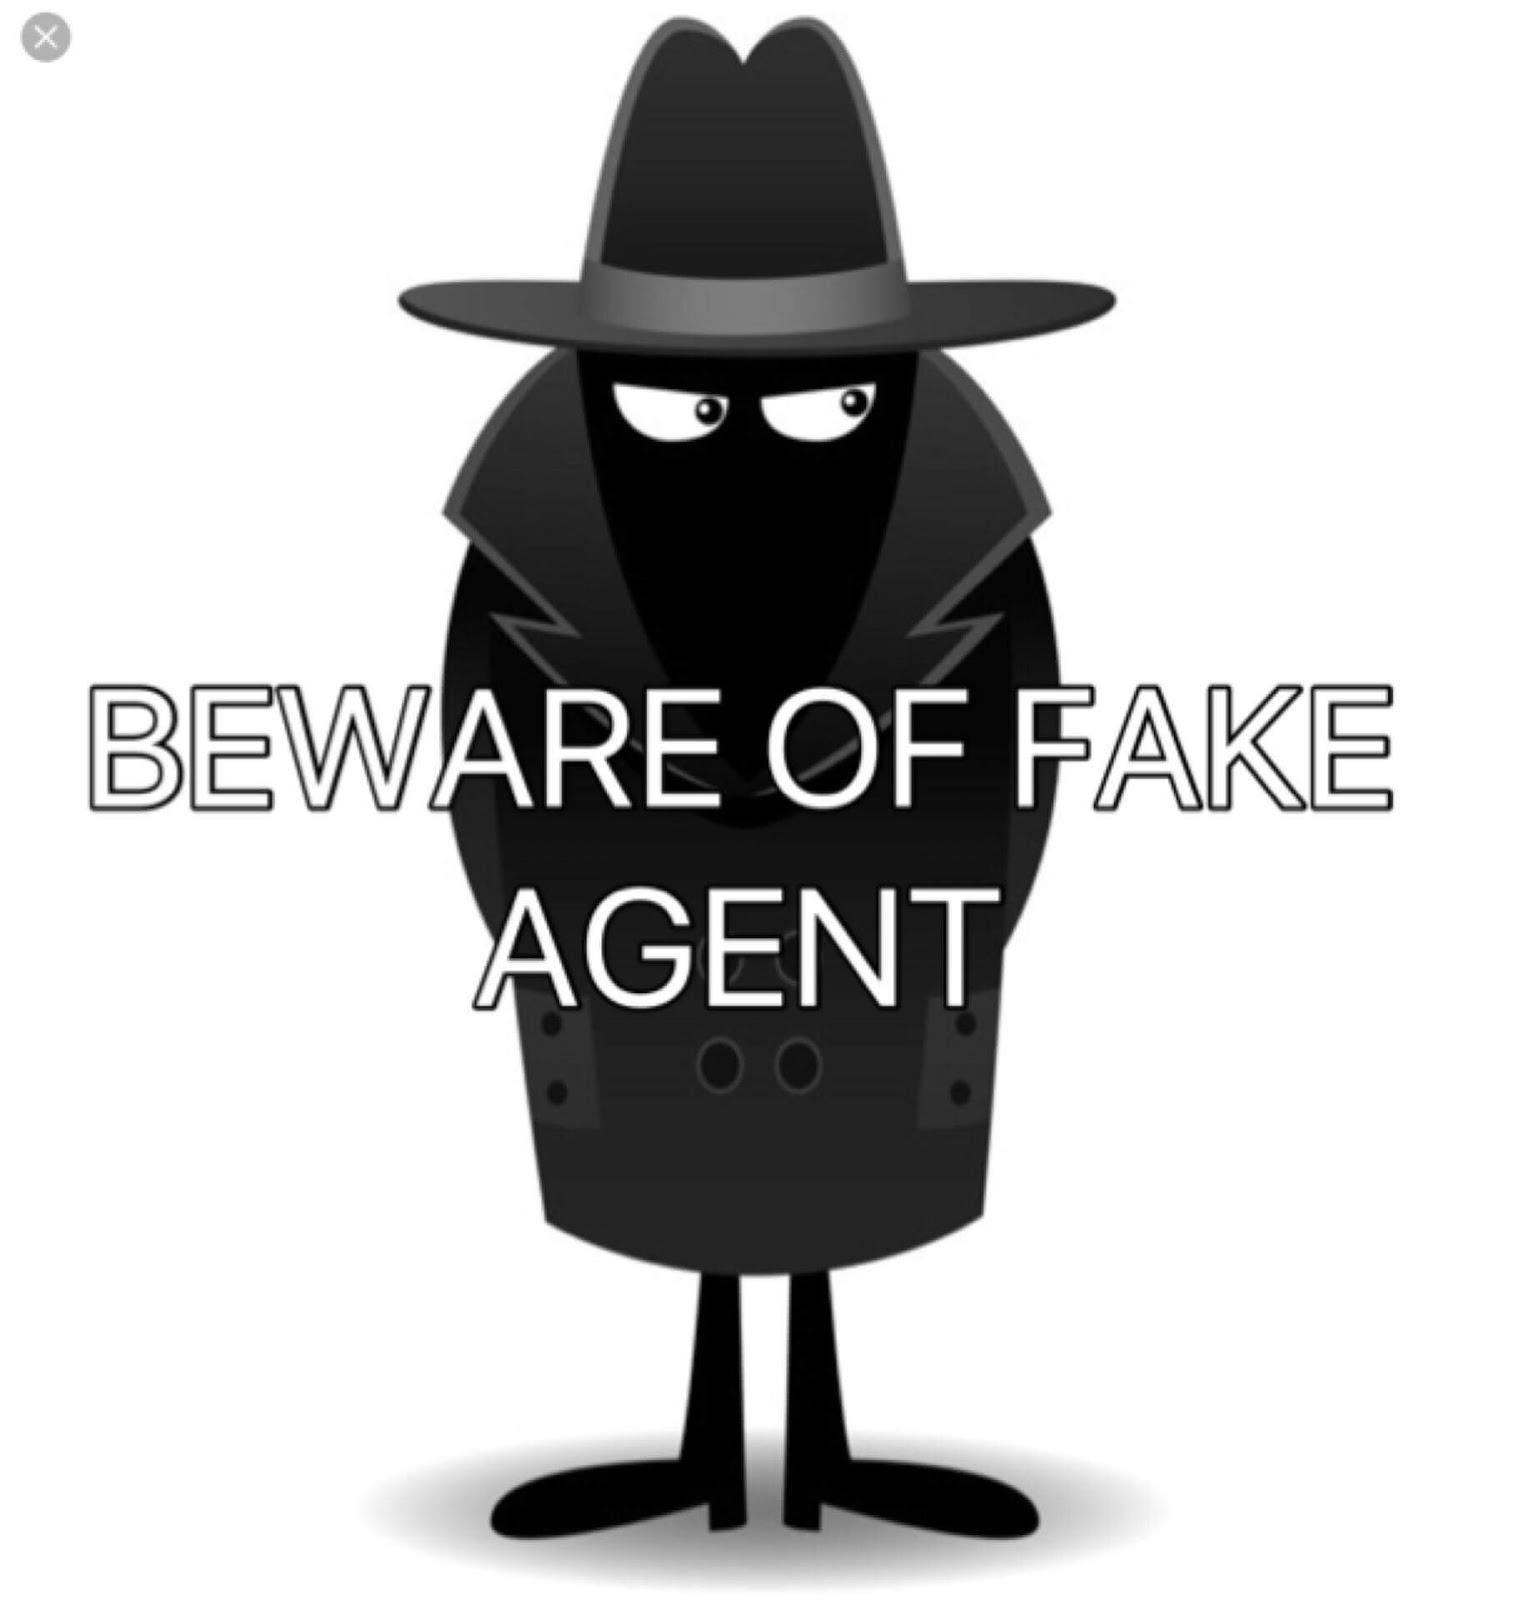 Agent Fake reminder:beware of fake agents ~ pinoy refresher